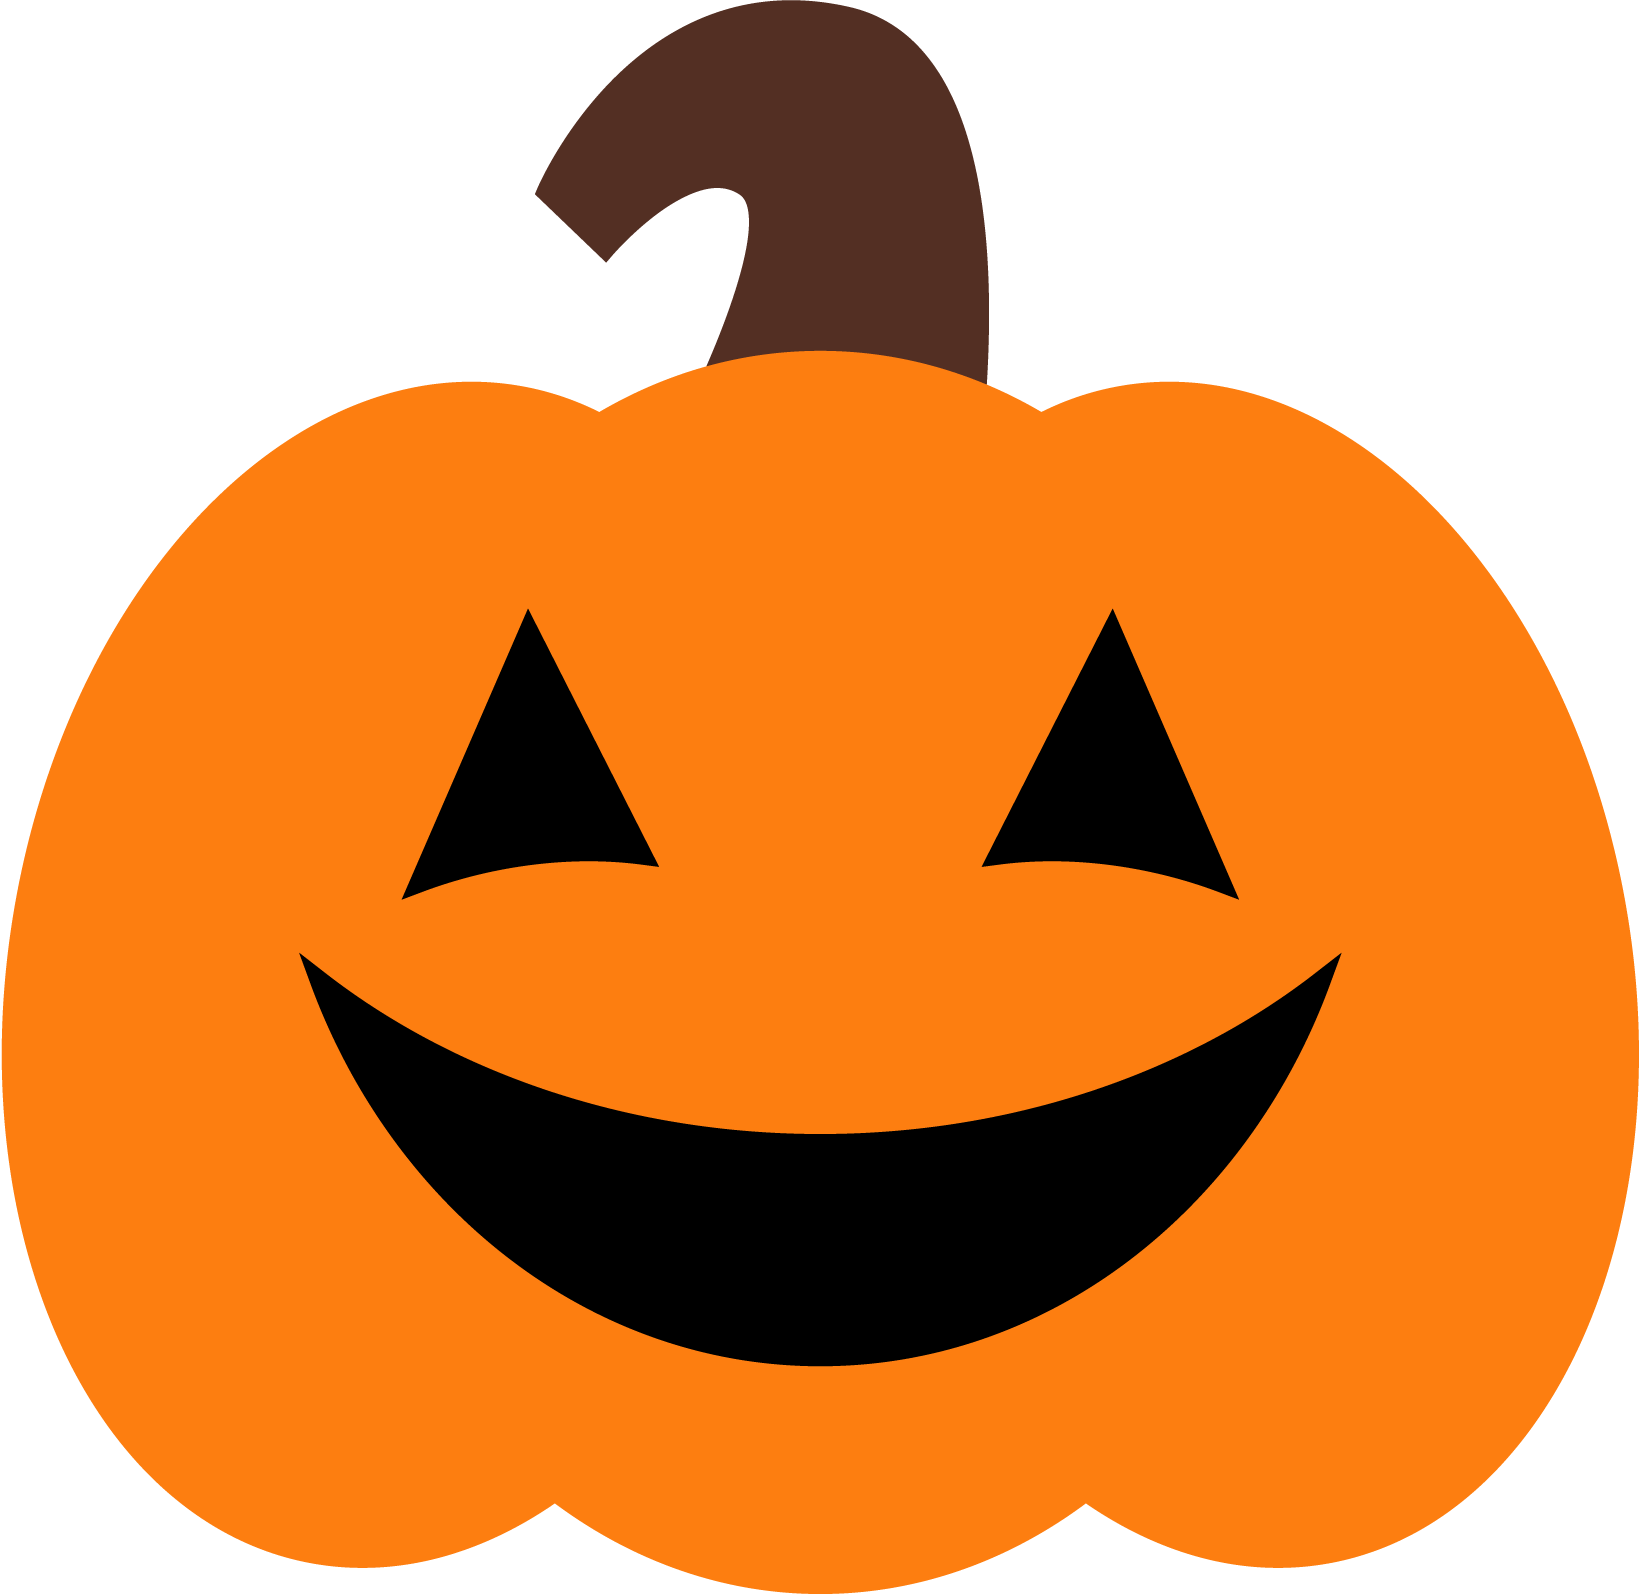 1642x1596 Cute Halloween Pumpkin Clipart Cyberuse